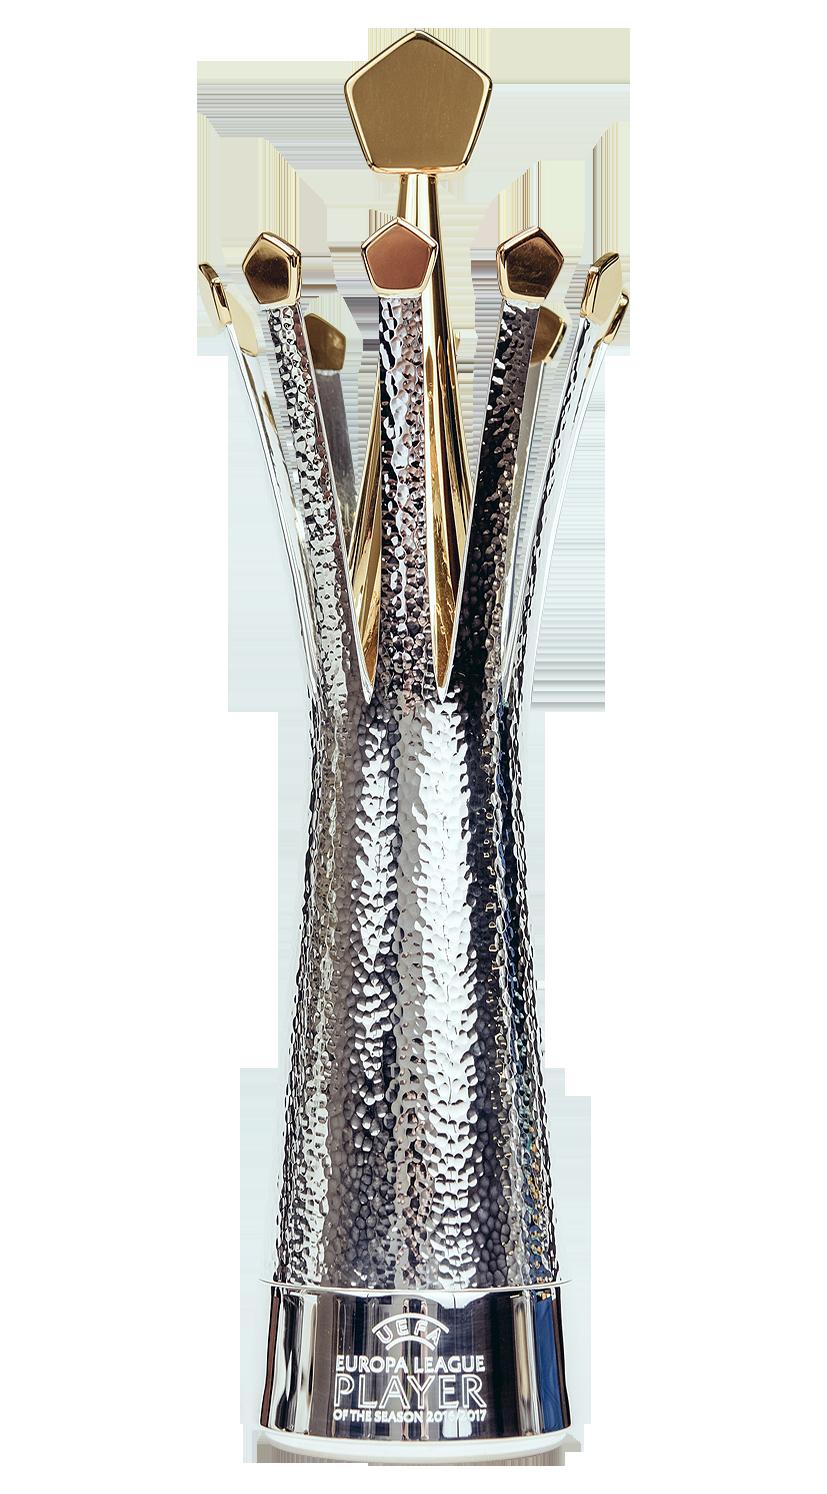 Uefa Europa League Trophy - Uefa Confirm Details Of New ...